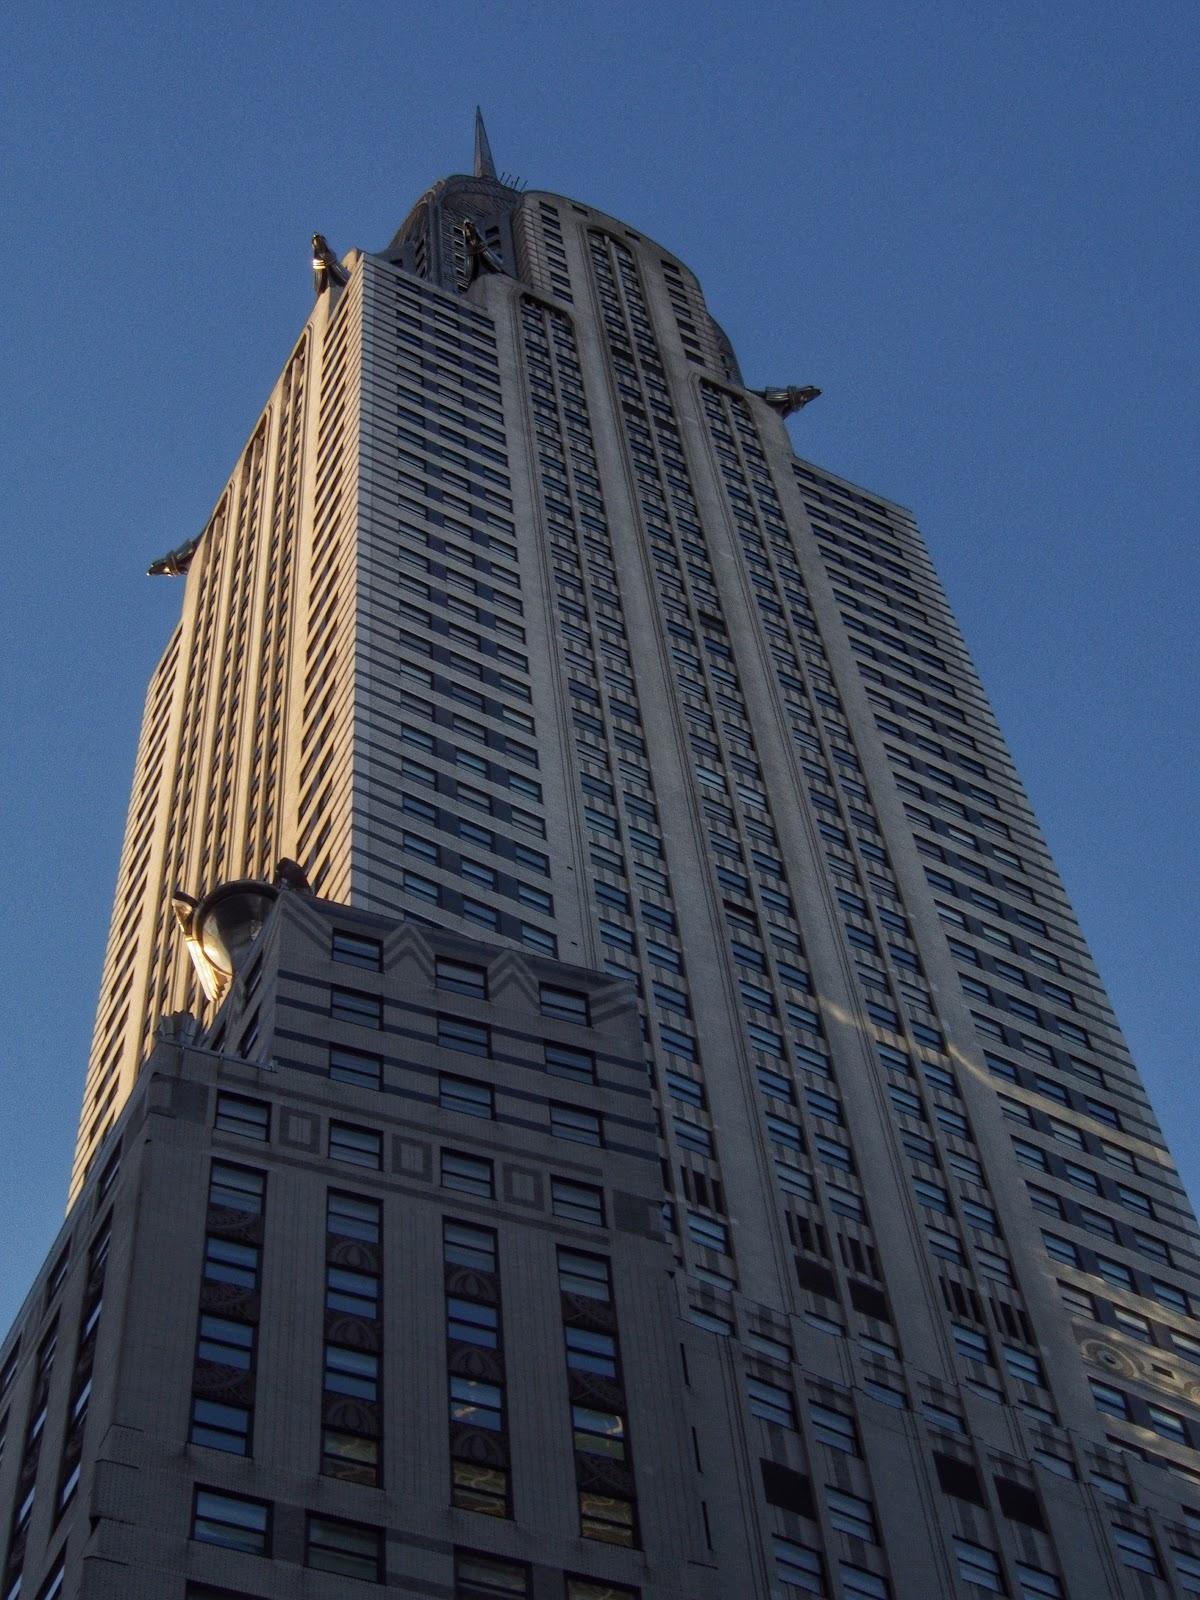 Vertigo, #ChryslerBuilding #AlwaysLookUp #artdeco #architecture #NYC 2014